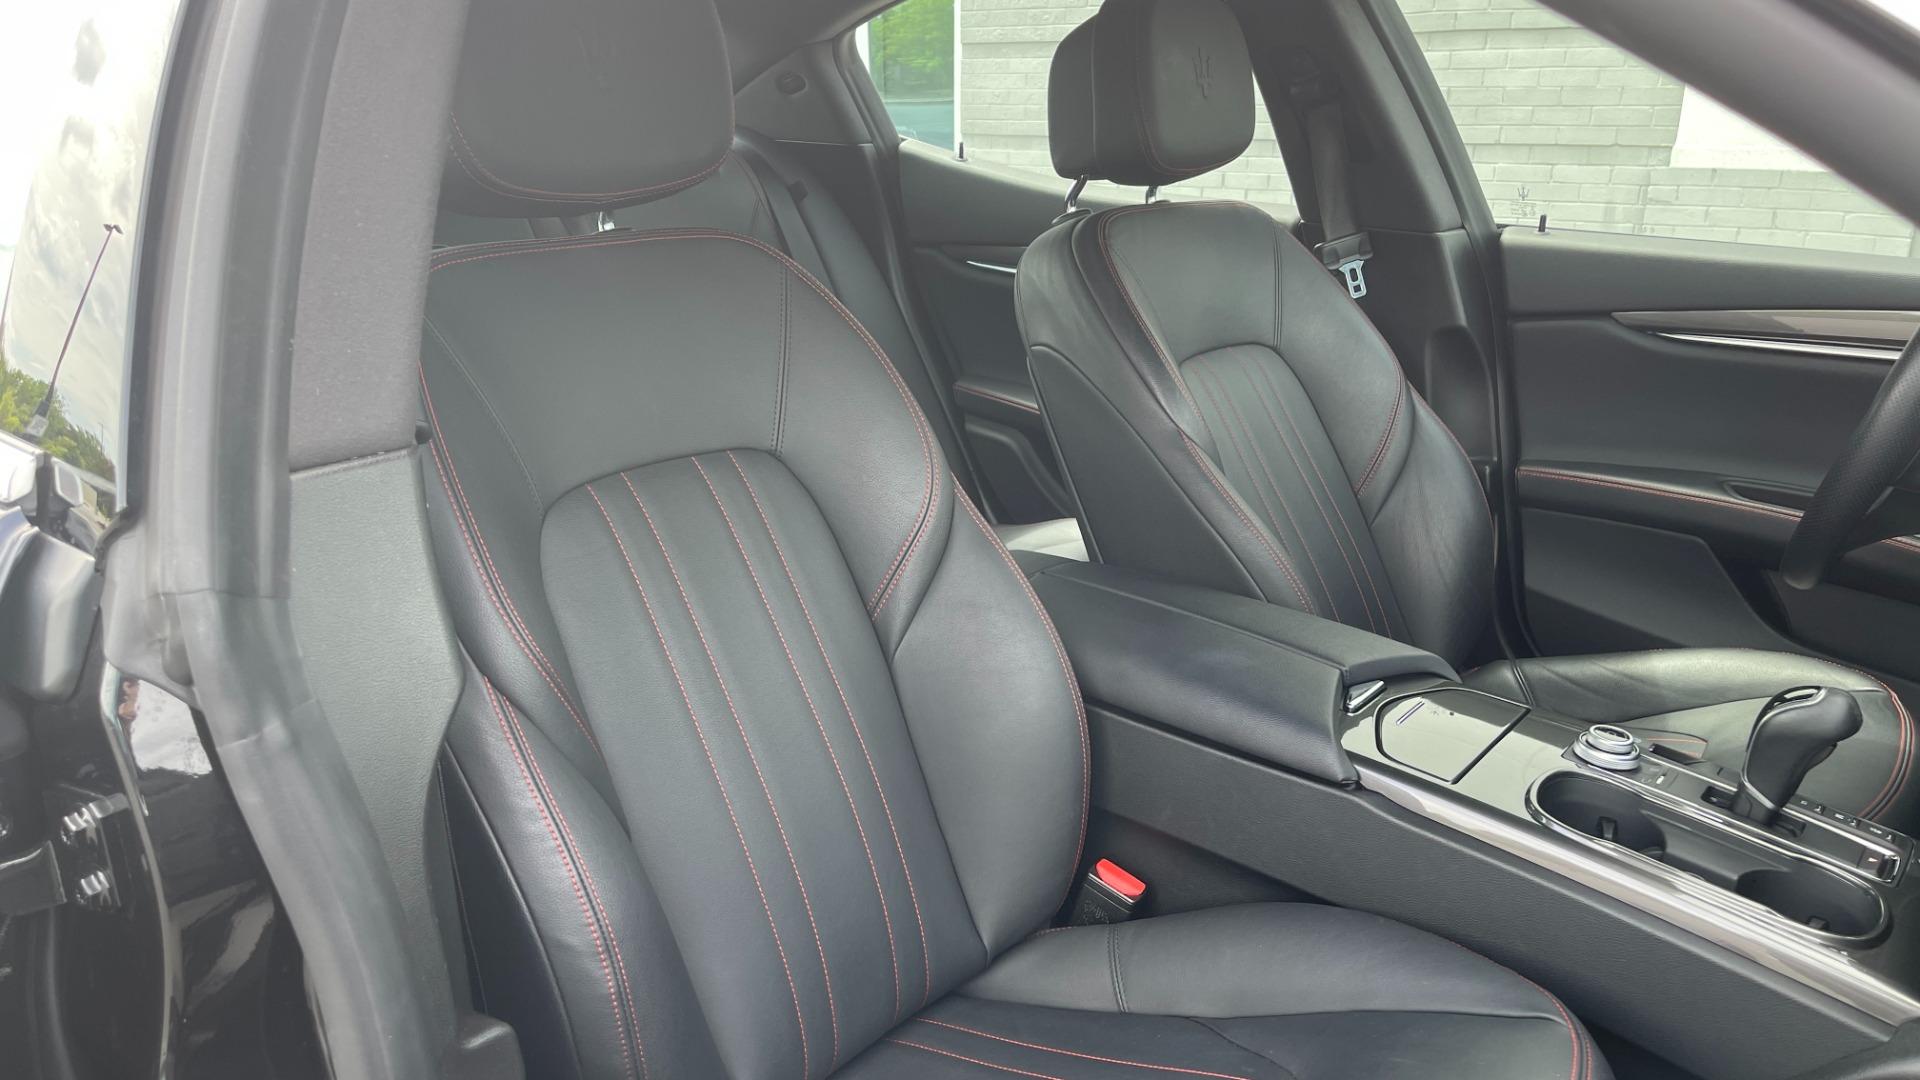 Used 2018 Maserati GHIBLI S Q4 SEDAN / AWD / 3.0L V6 / SUNROOF / NAV / REARVIEW for sale $51,995 at Formula Imports in Charlotte NC 28227 63